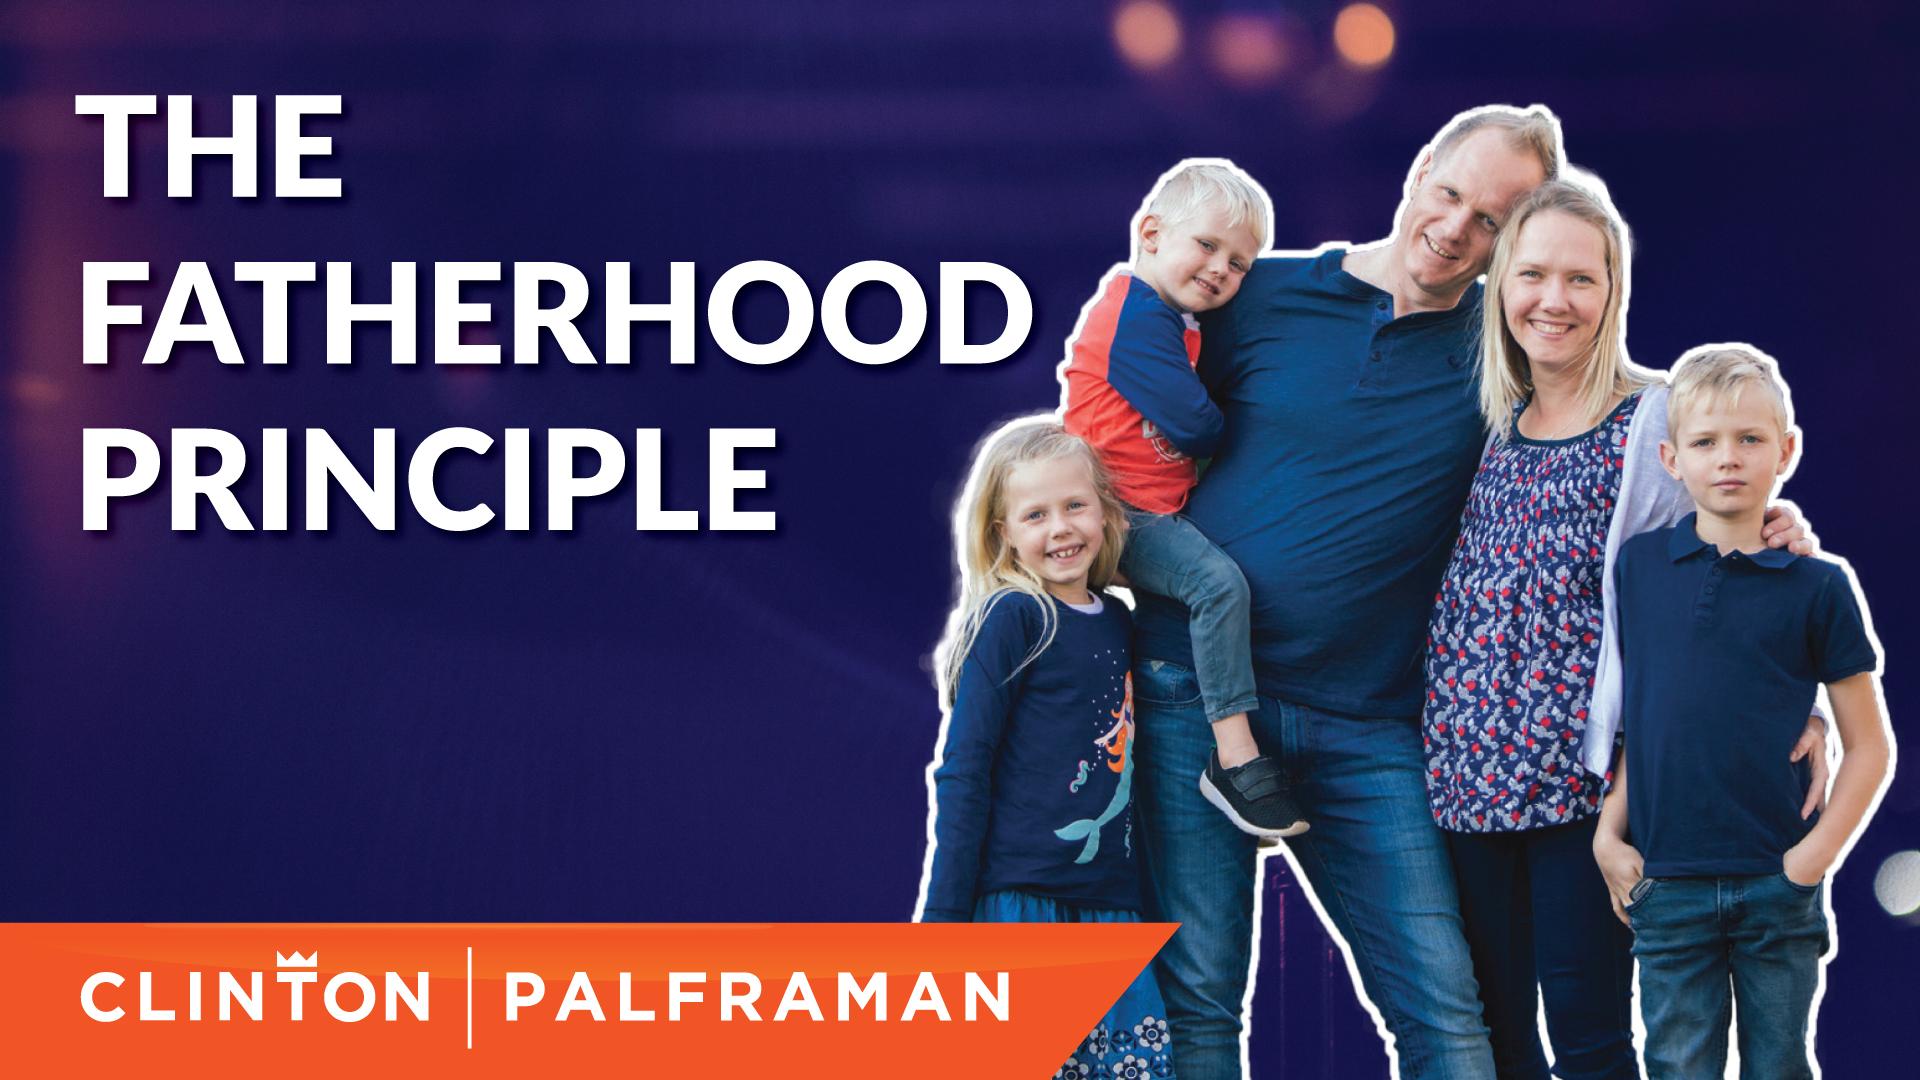 The Fatherhood Principle. #1 The Foundation of Family